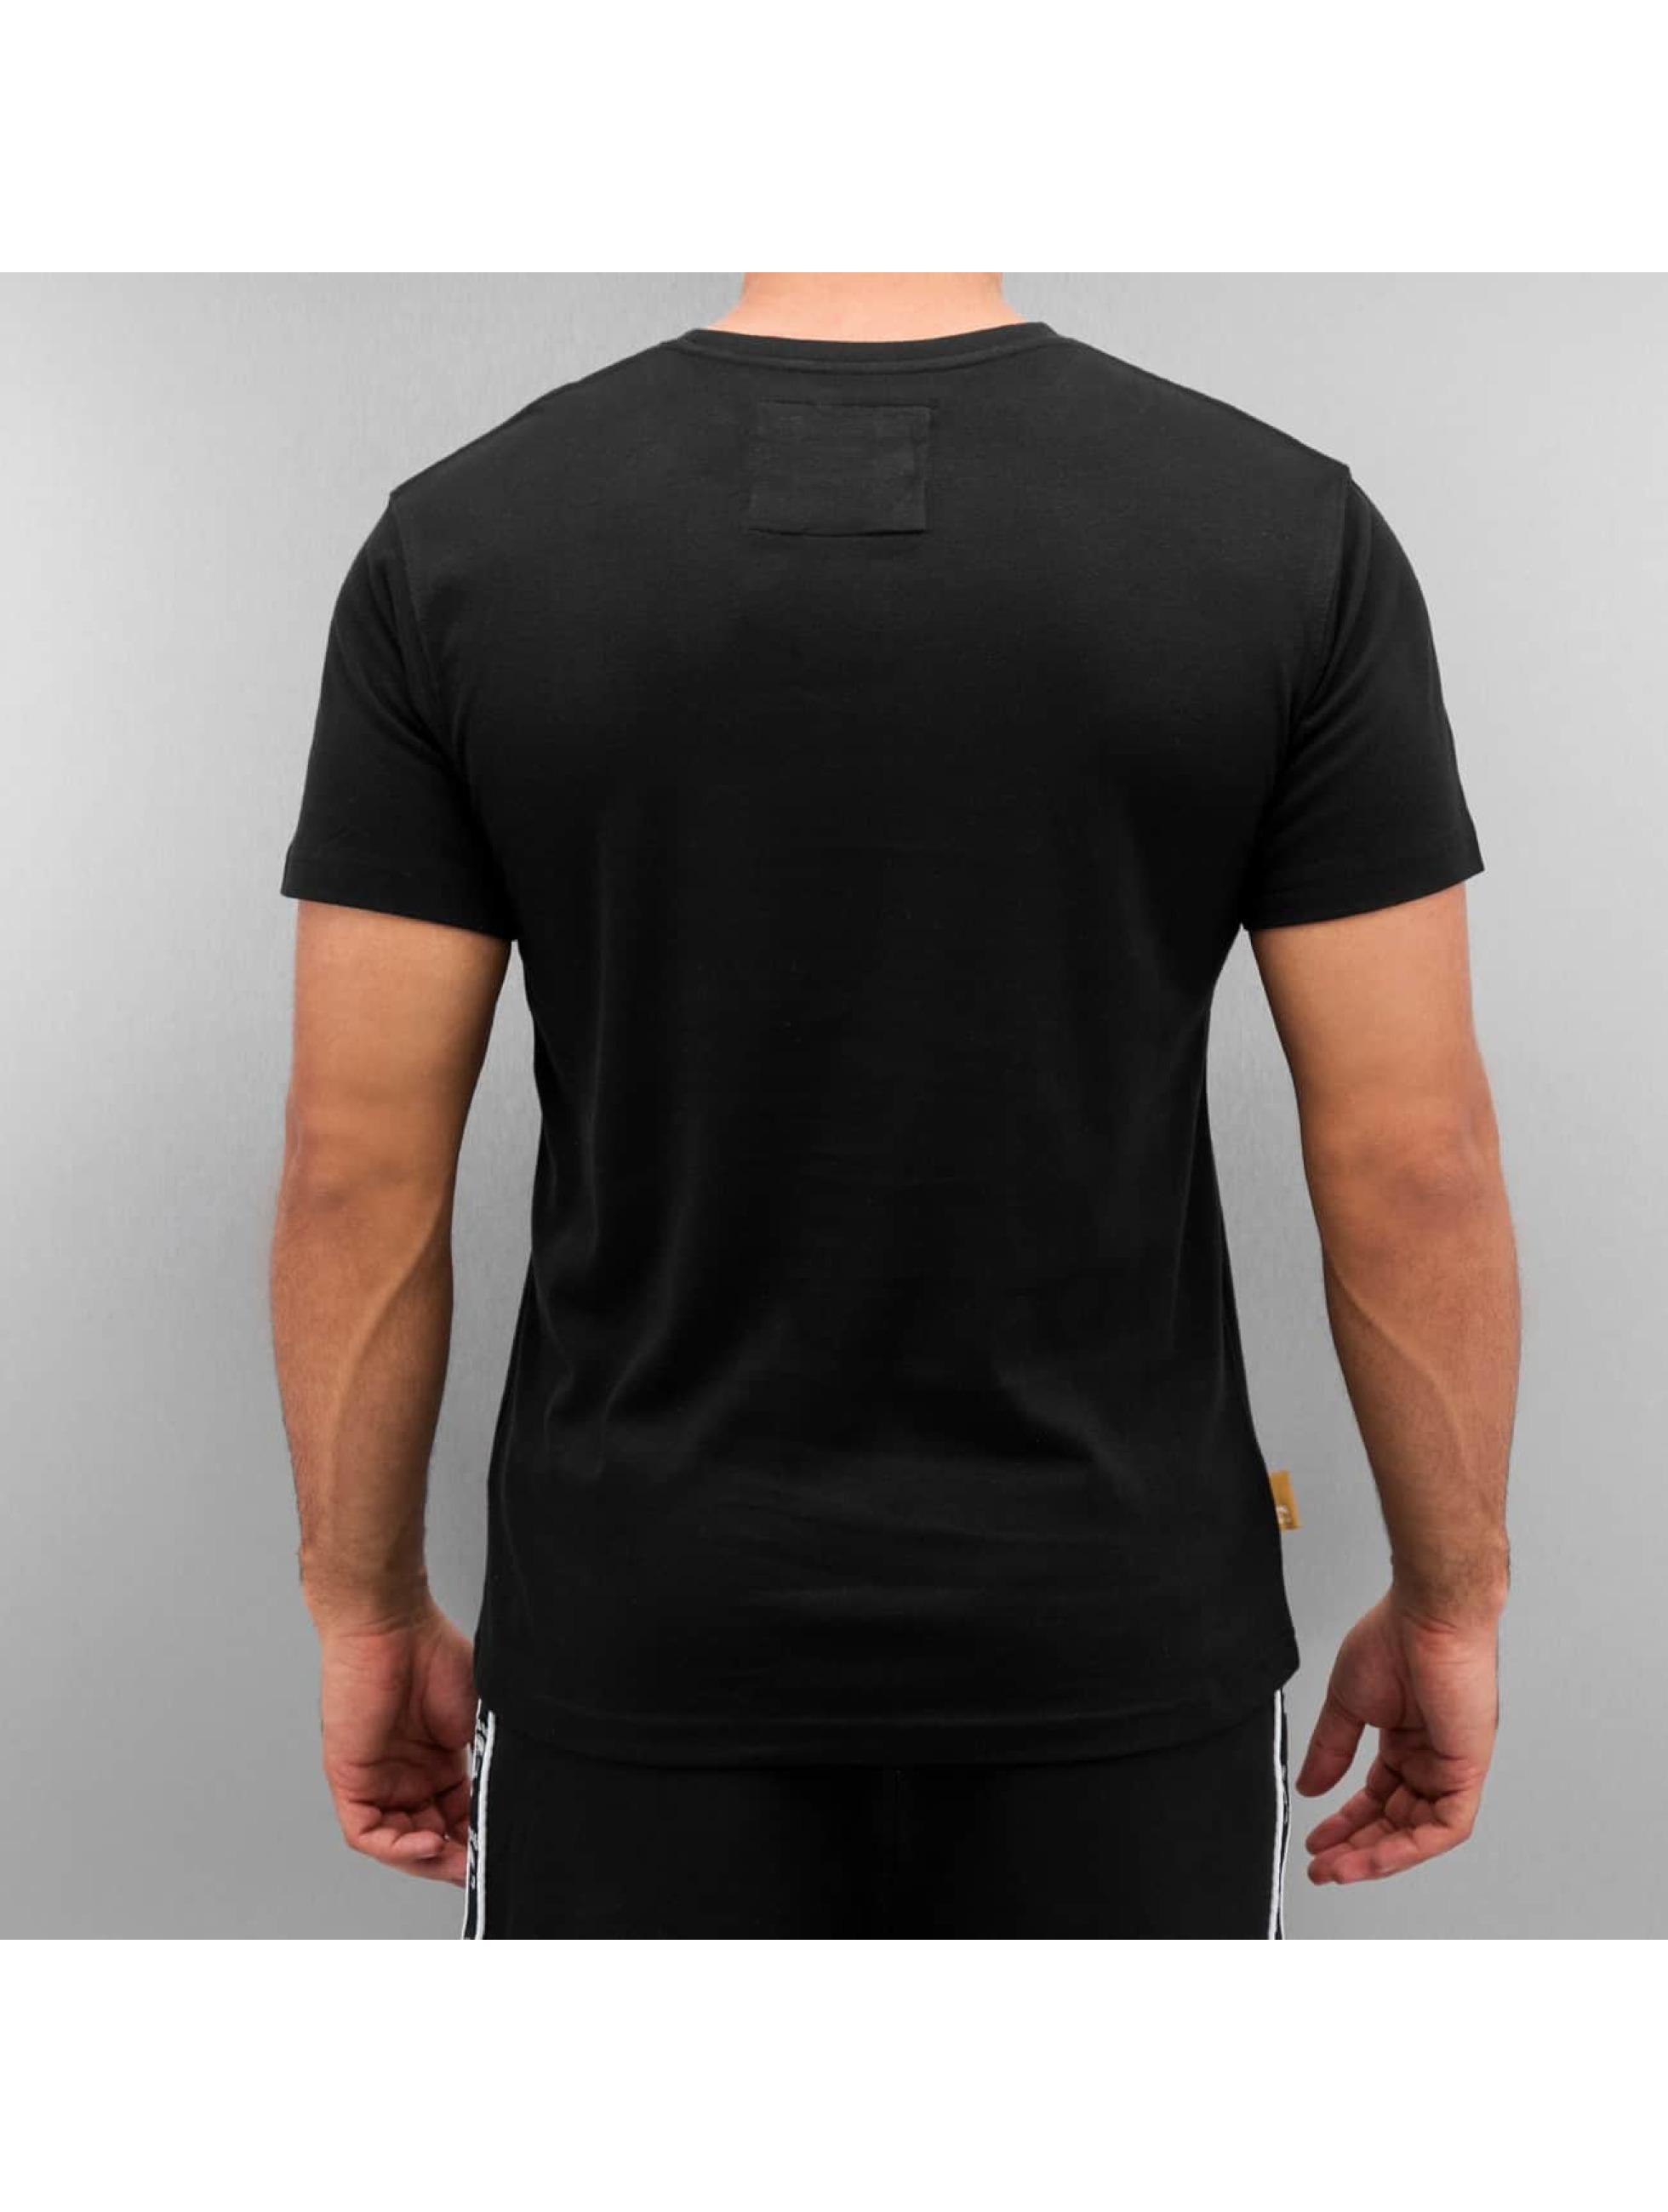 CHABOS IIVII T-Shirt 33 schwarz